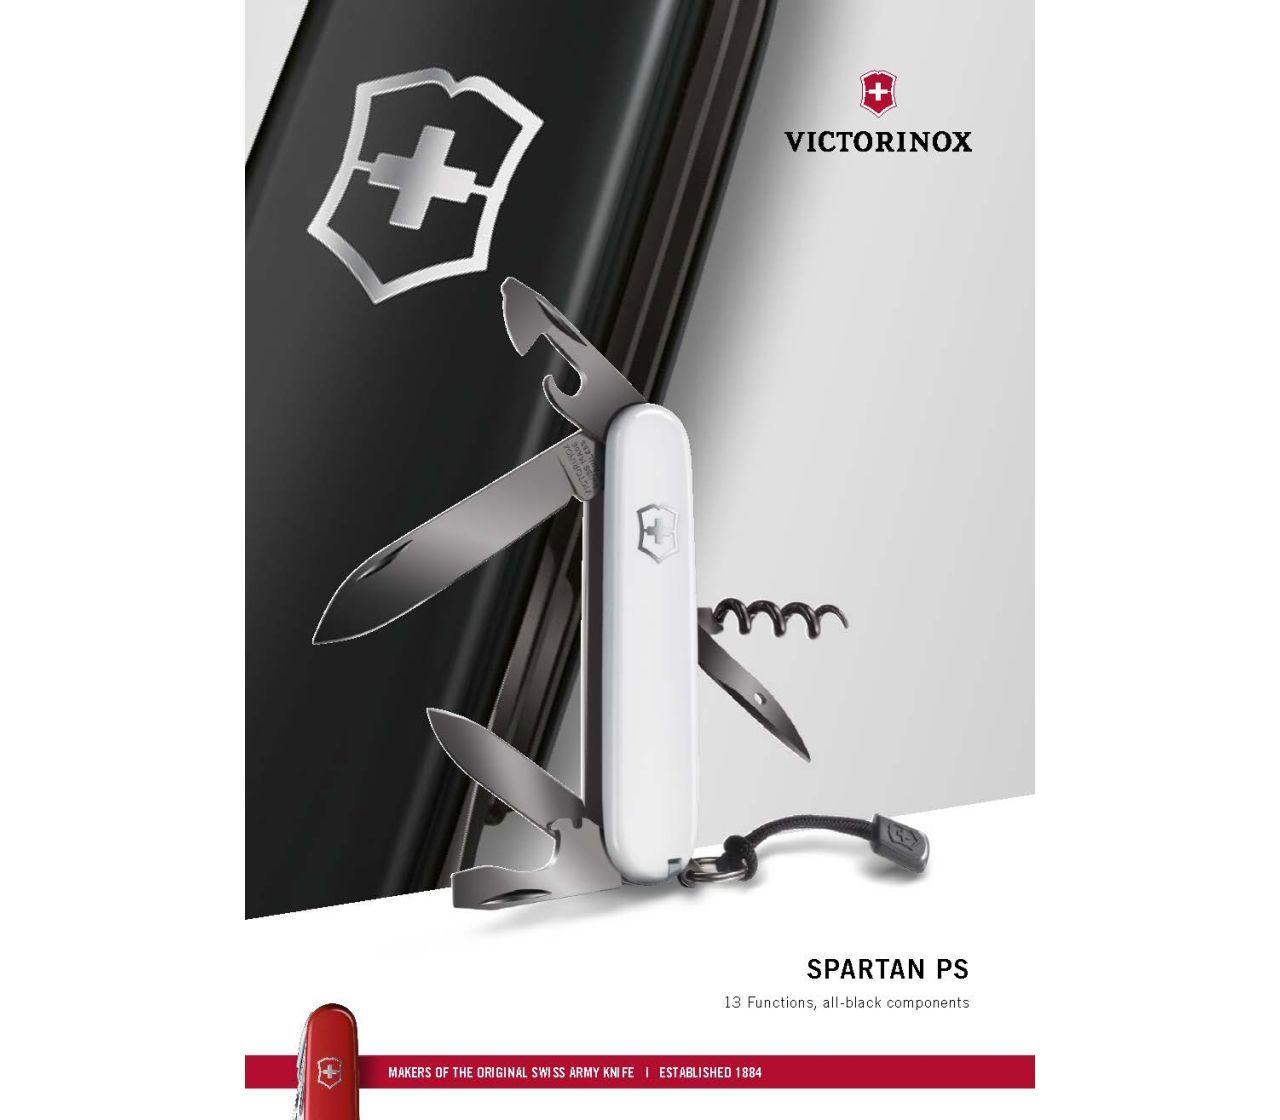 Spartan PS White Victorinox (1.3603.7P)